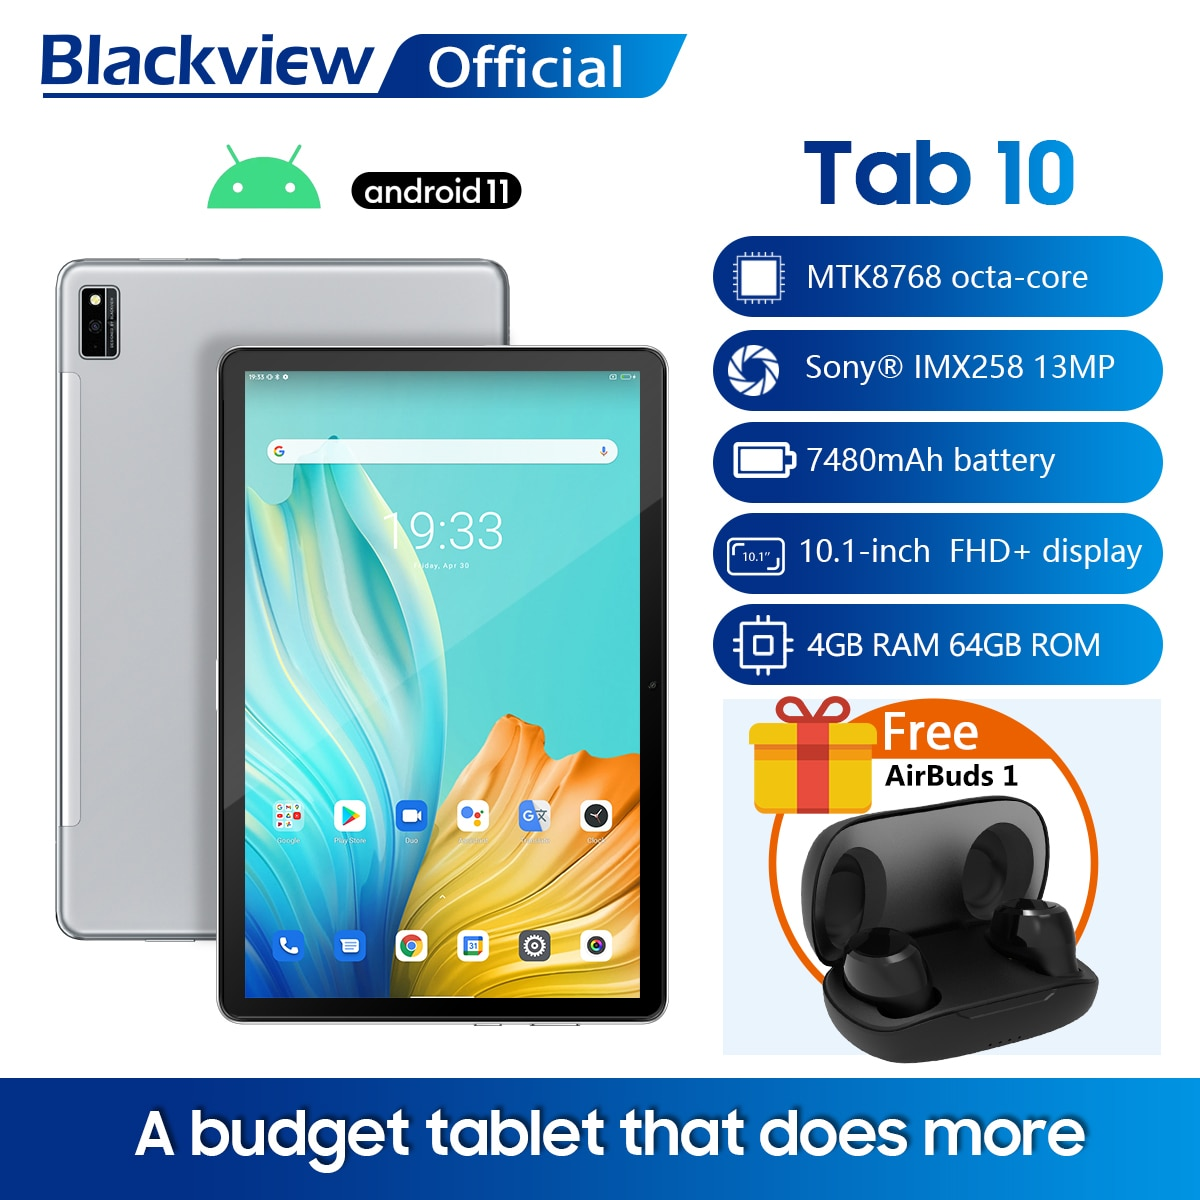 Blackview TAB 10 Android 11 Tablet 10.1'' MTK8768 Octa Core 1920x1200 4GB RAM 64GB ROM 4G Network 7480mAh Tablets PC Dual Wifi